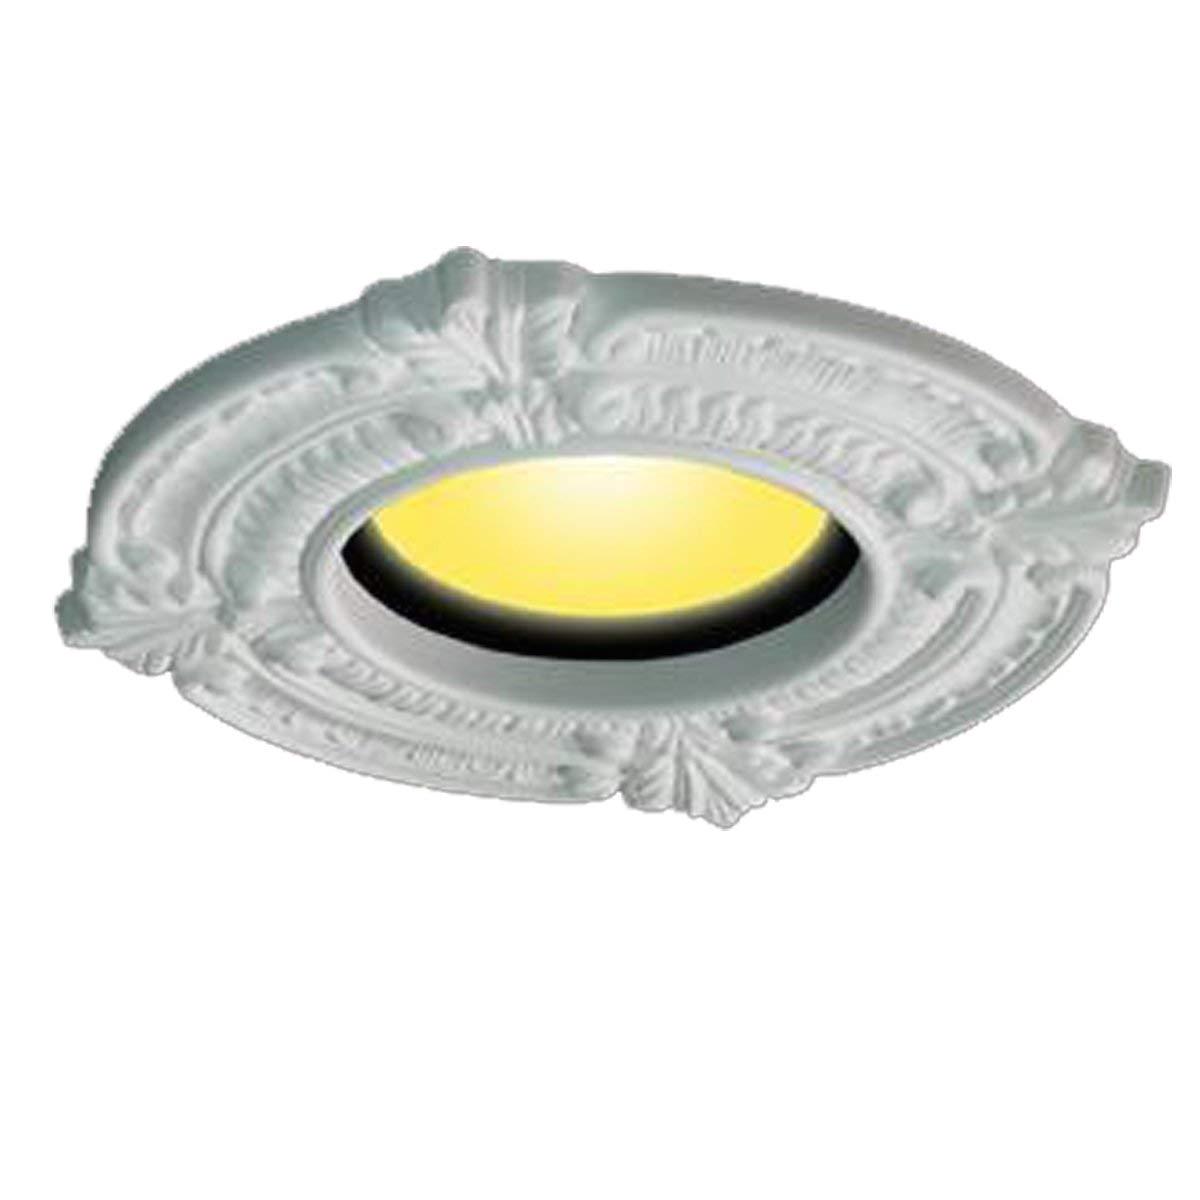 white ceiling medallion urethane recessed trim rosette 6 id x 10 od renovator s supply recessed light fixture trims amazon com